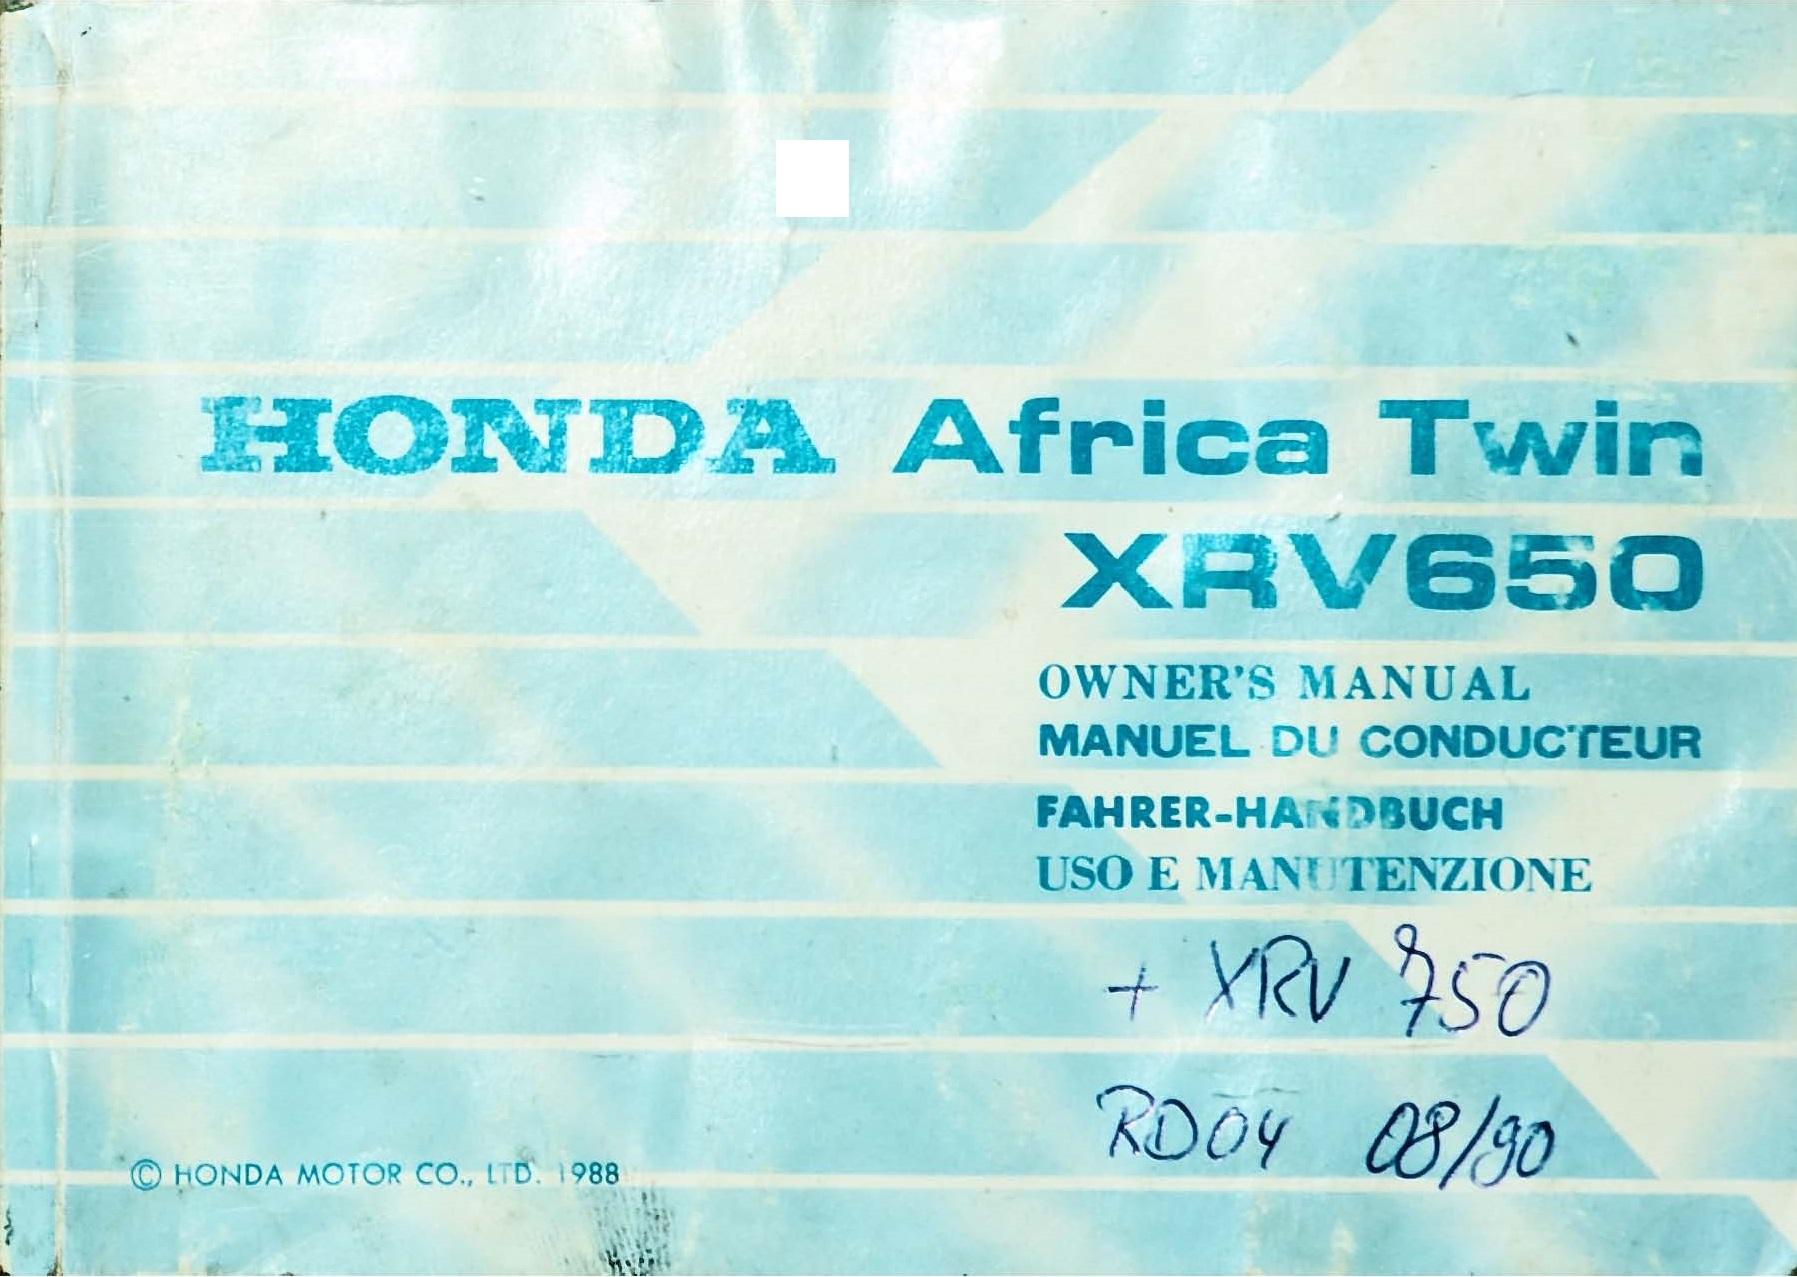 Owners manual for Honda XRV650 (1988)